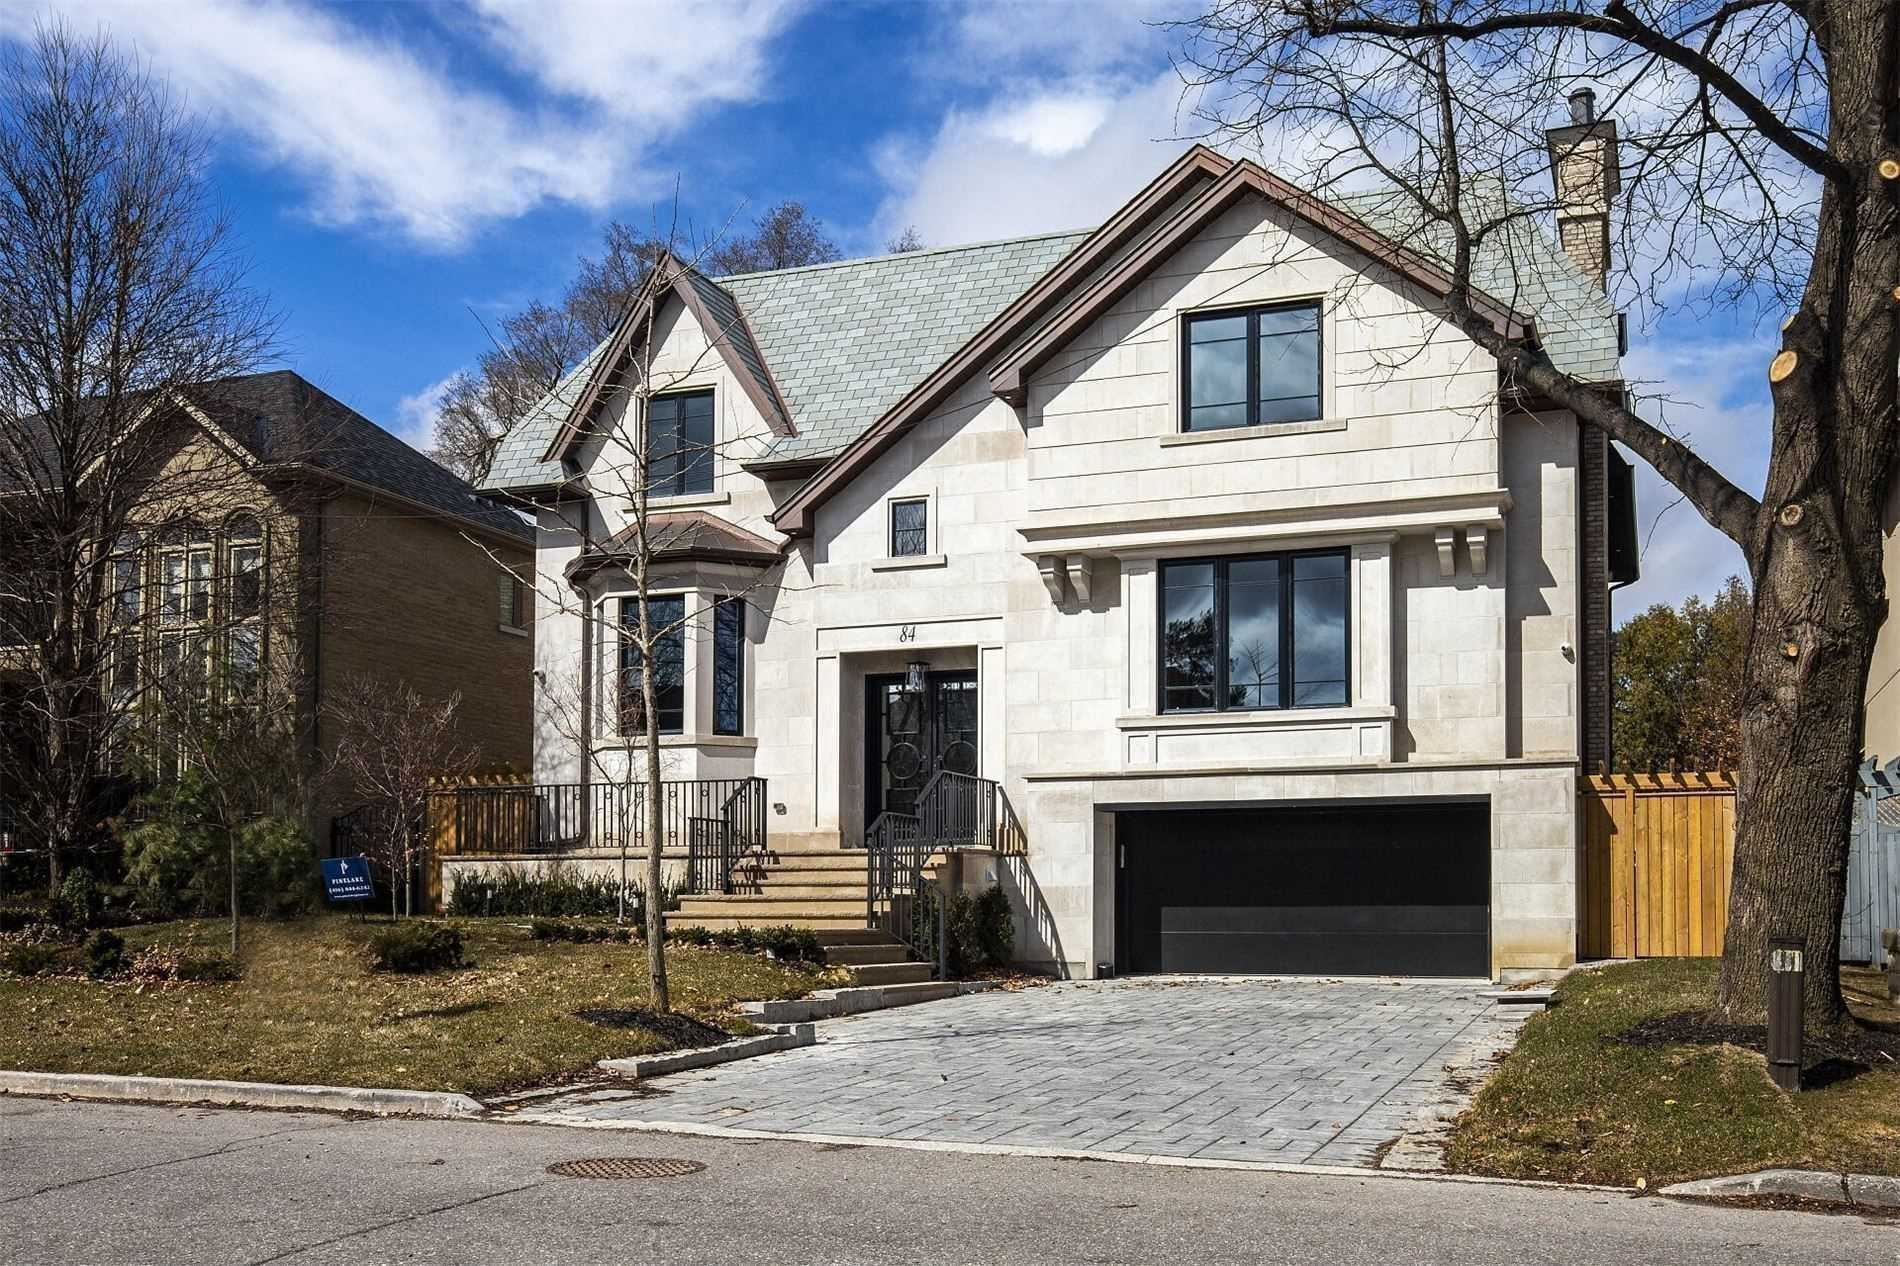 Detached house For Sale In Toronto - 84 Aldershot Cres, Toronto, Ontario, Canada M2P1M1 , 5 Bedrooms Bedrooms, ,8 BathroomsBathrooms,Detached,For Sale,Aldershot